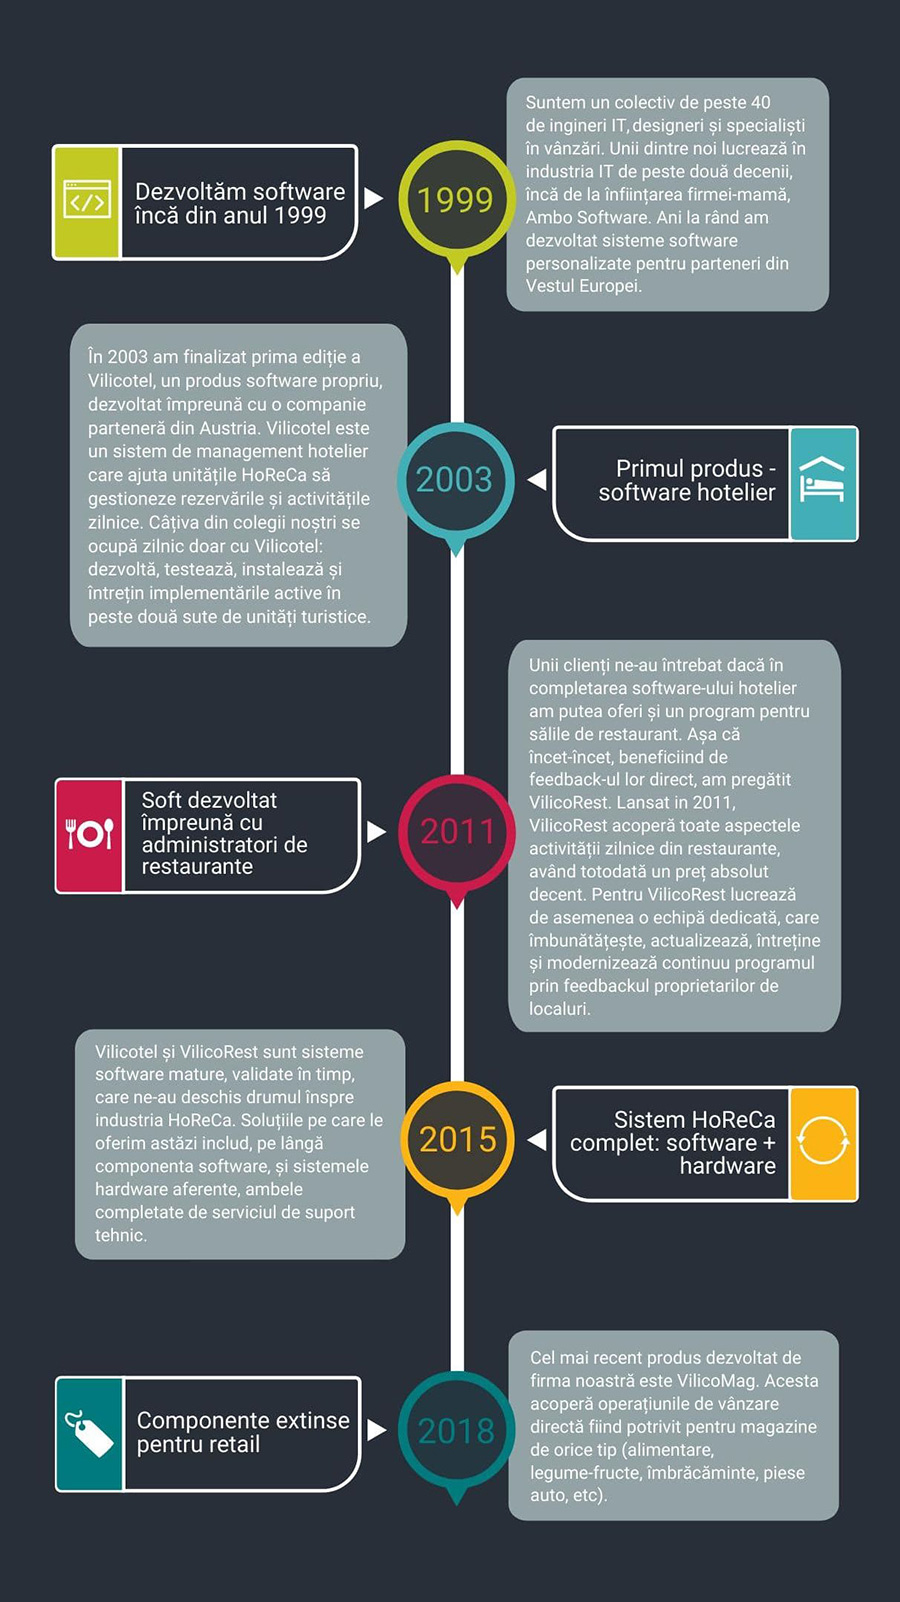 despre noi, infografic, istoria noastra, soft restaurant VilicoRest